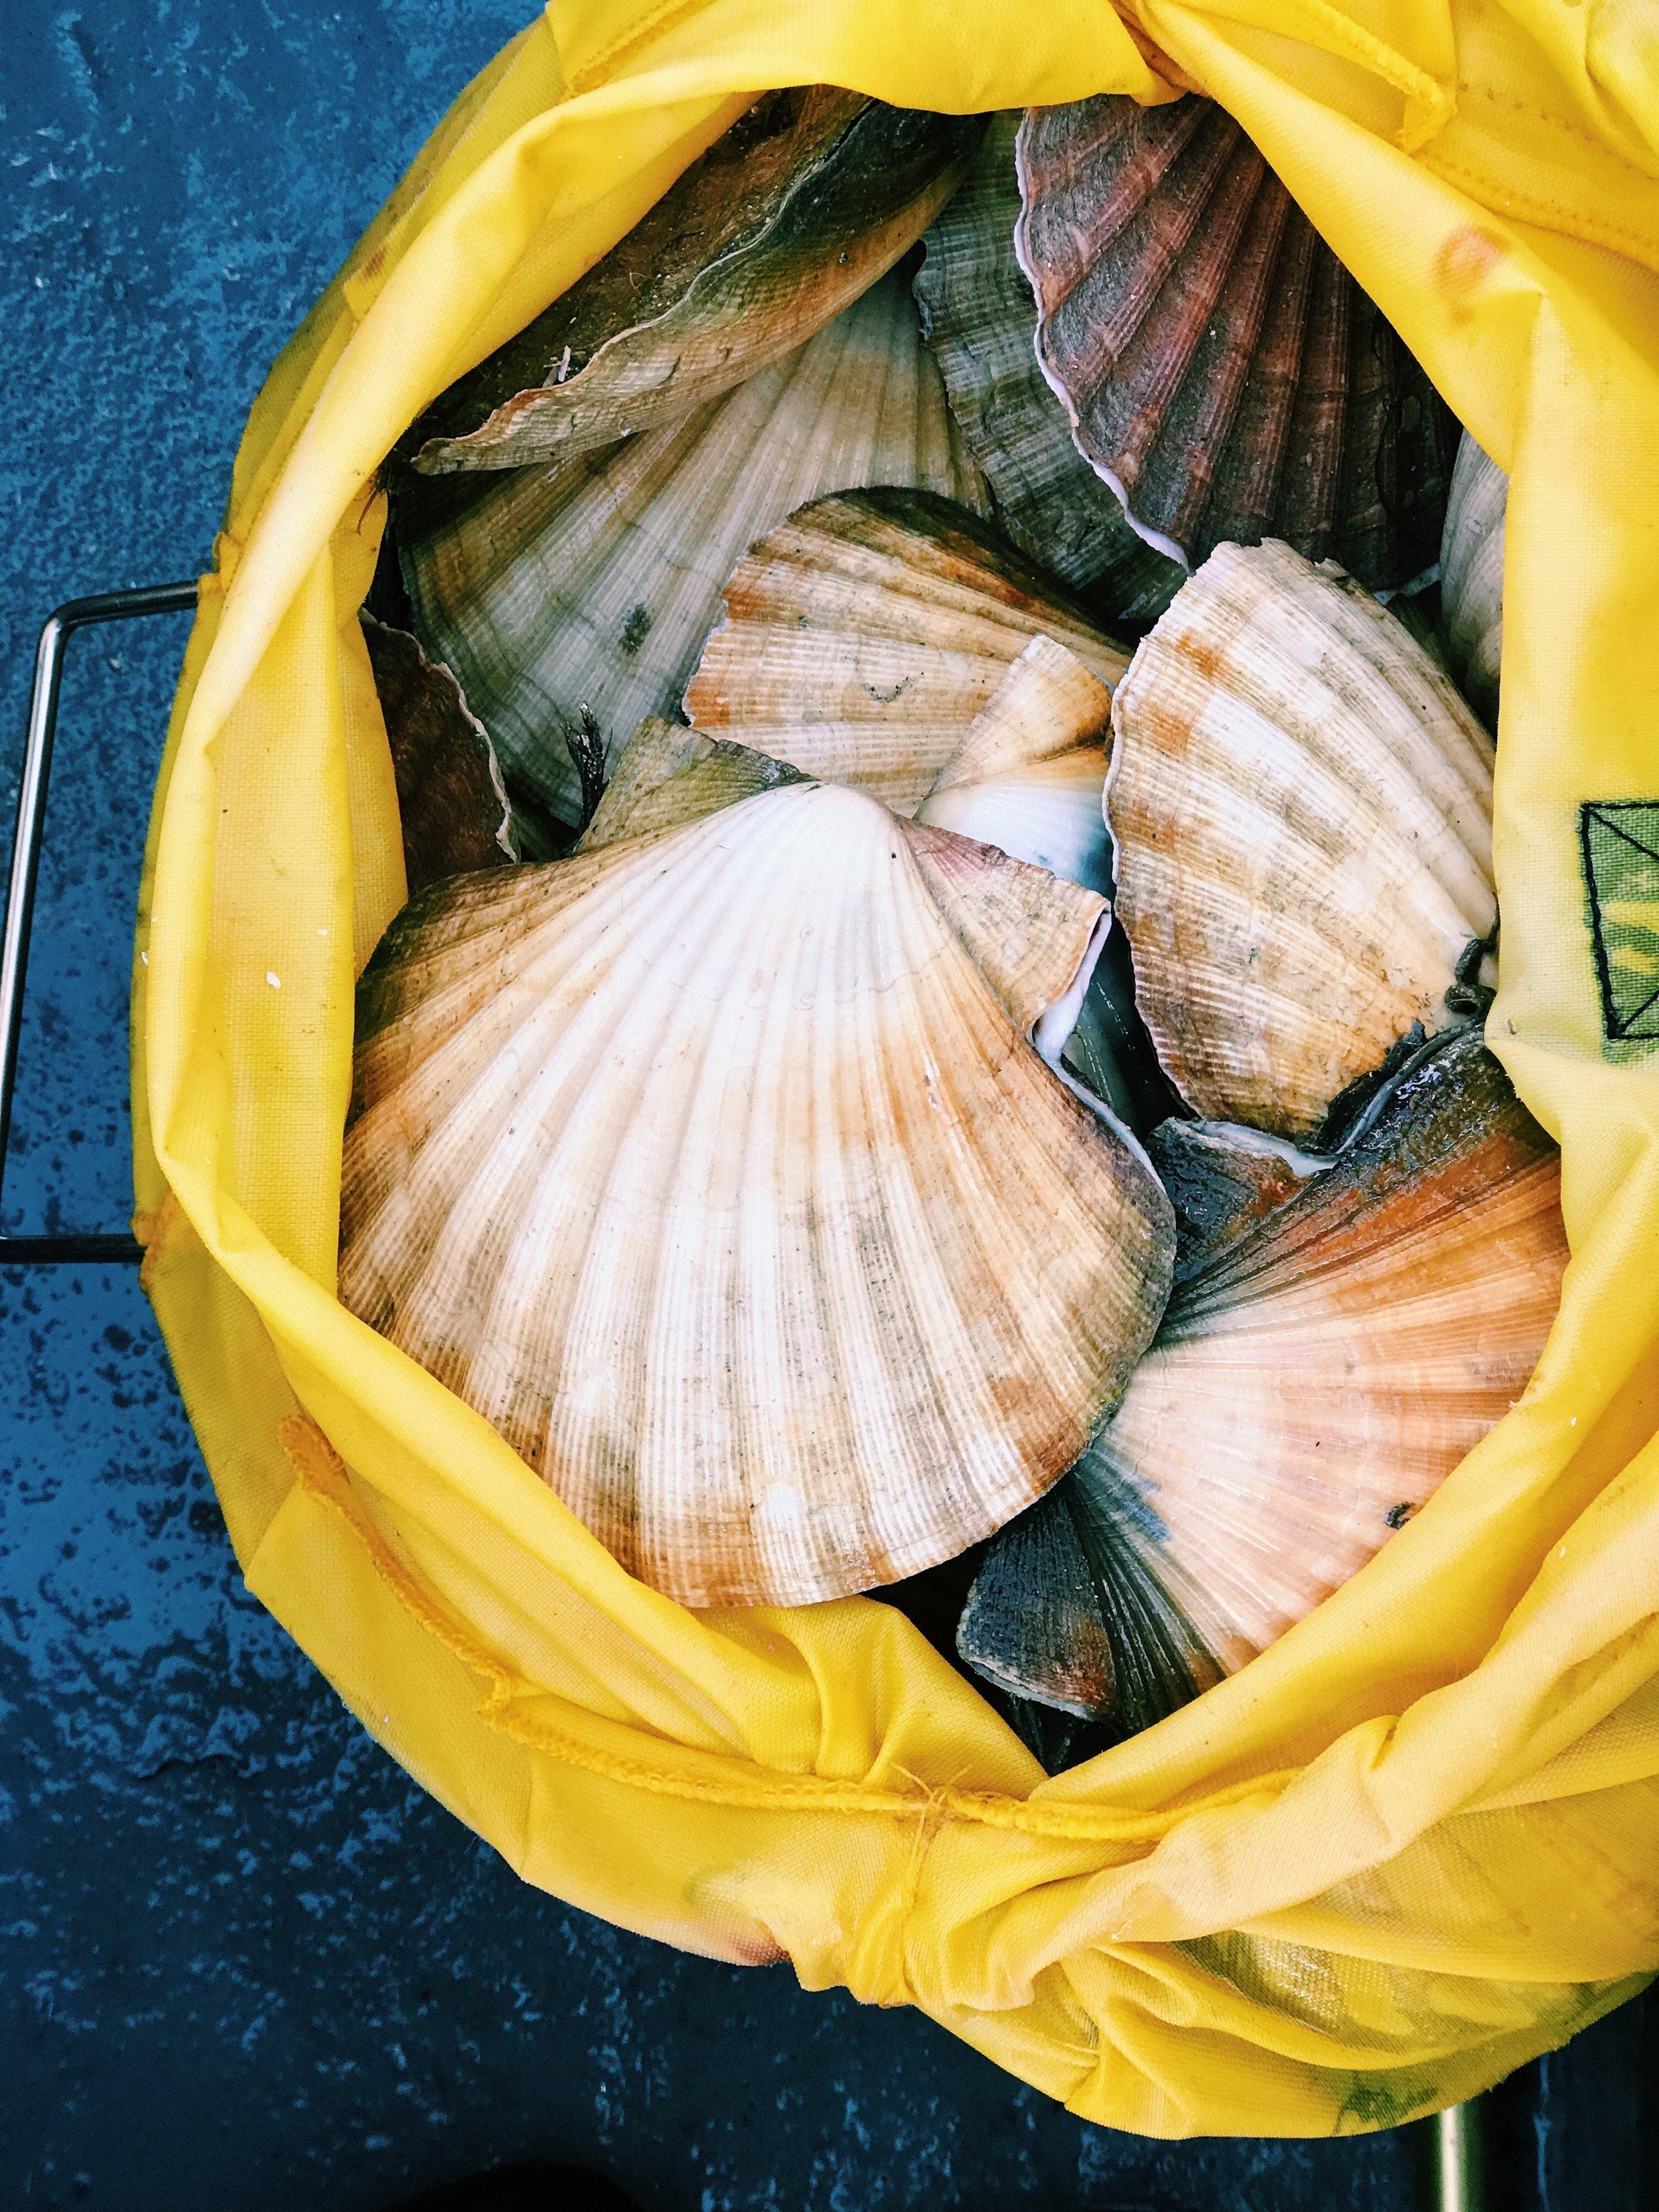 bivalve-clam-scallop-1368519.jpg